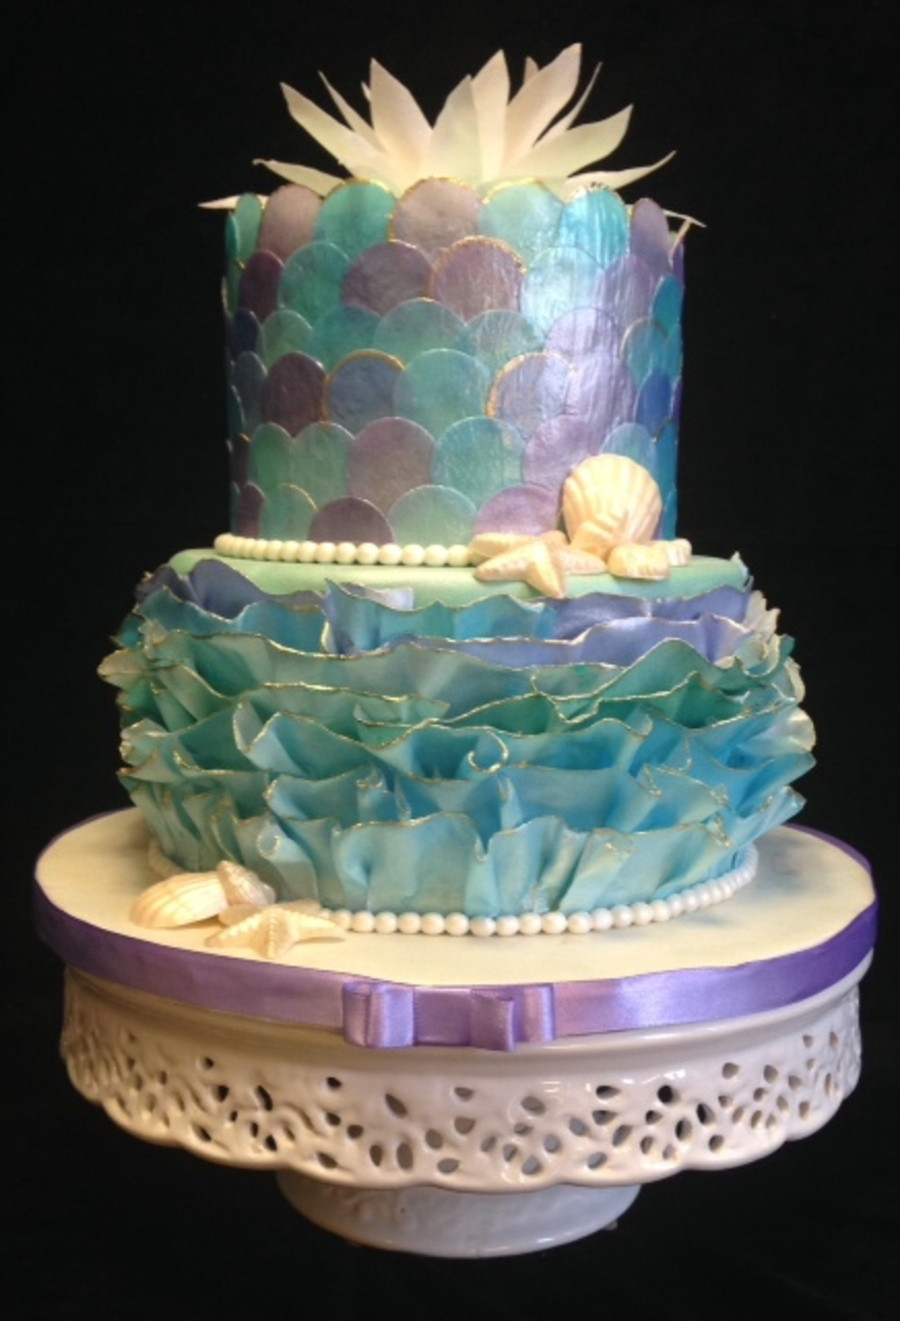 Mermaid Birthday Cake  Decoupage Mermaid Cake CakeCentral